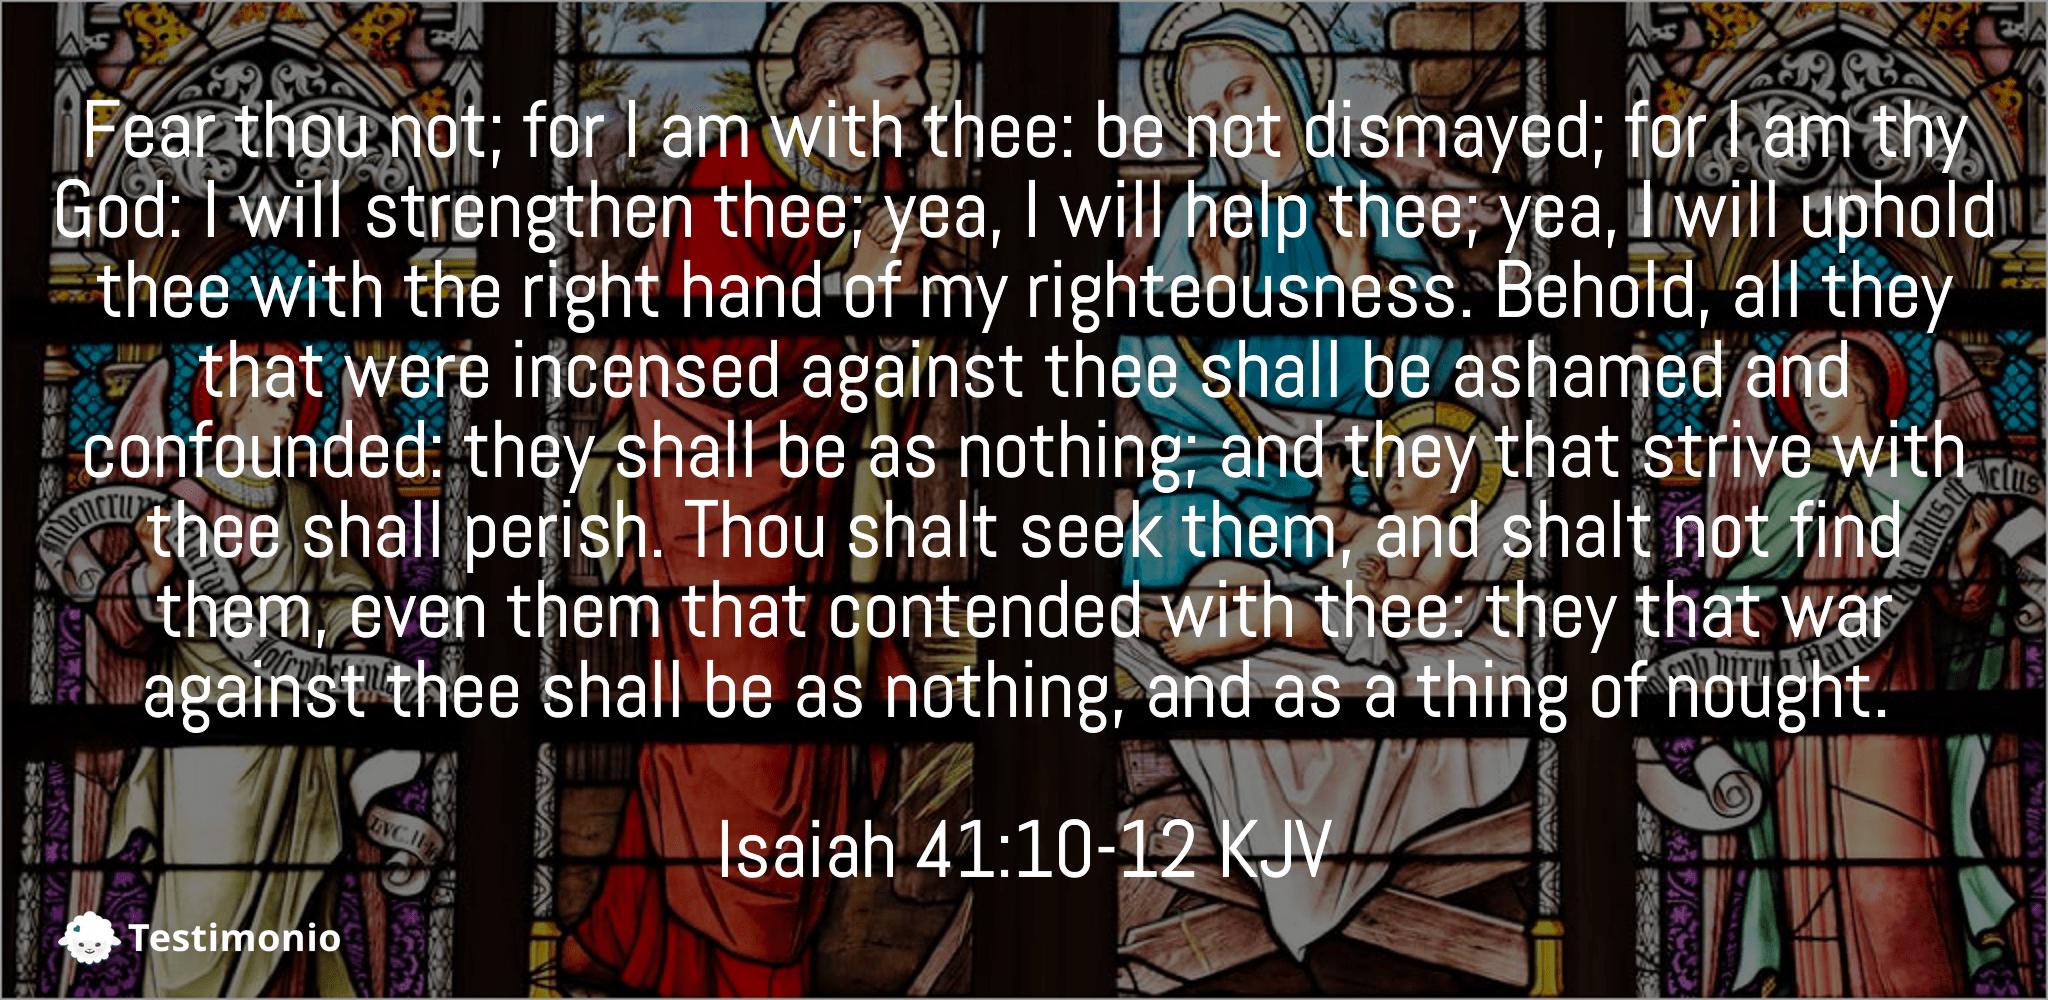 Isaiah 41:10-12